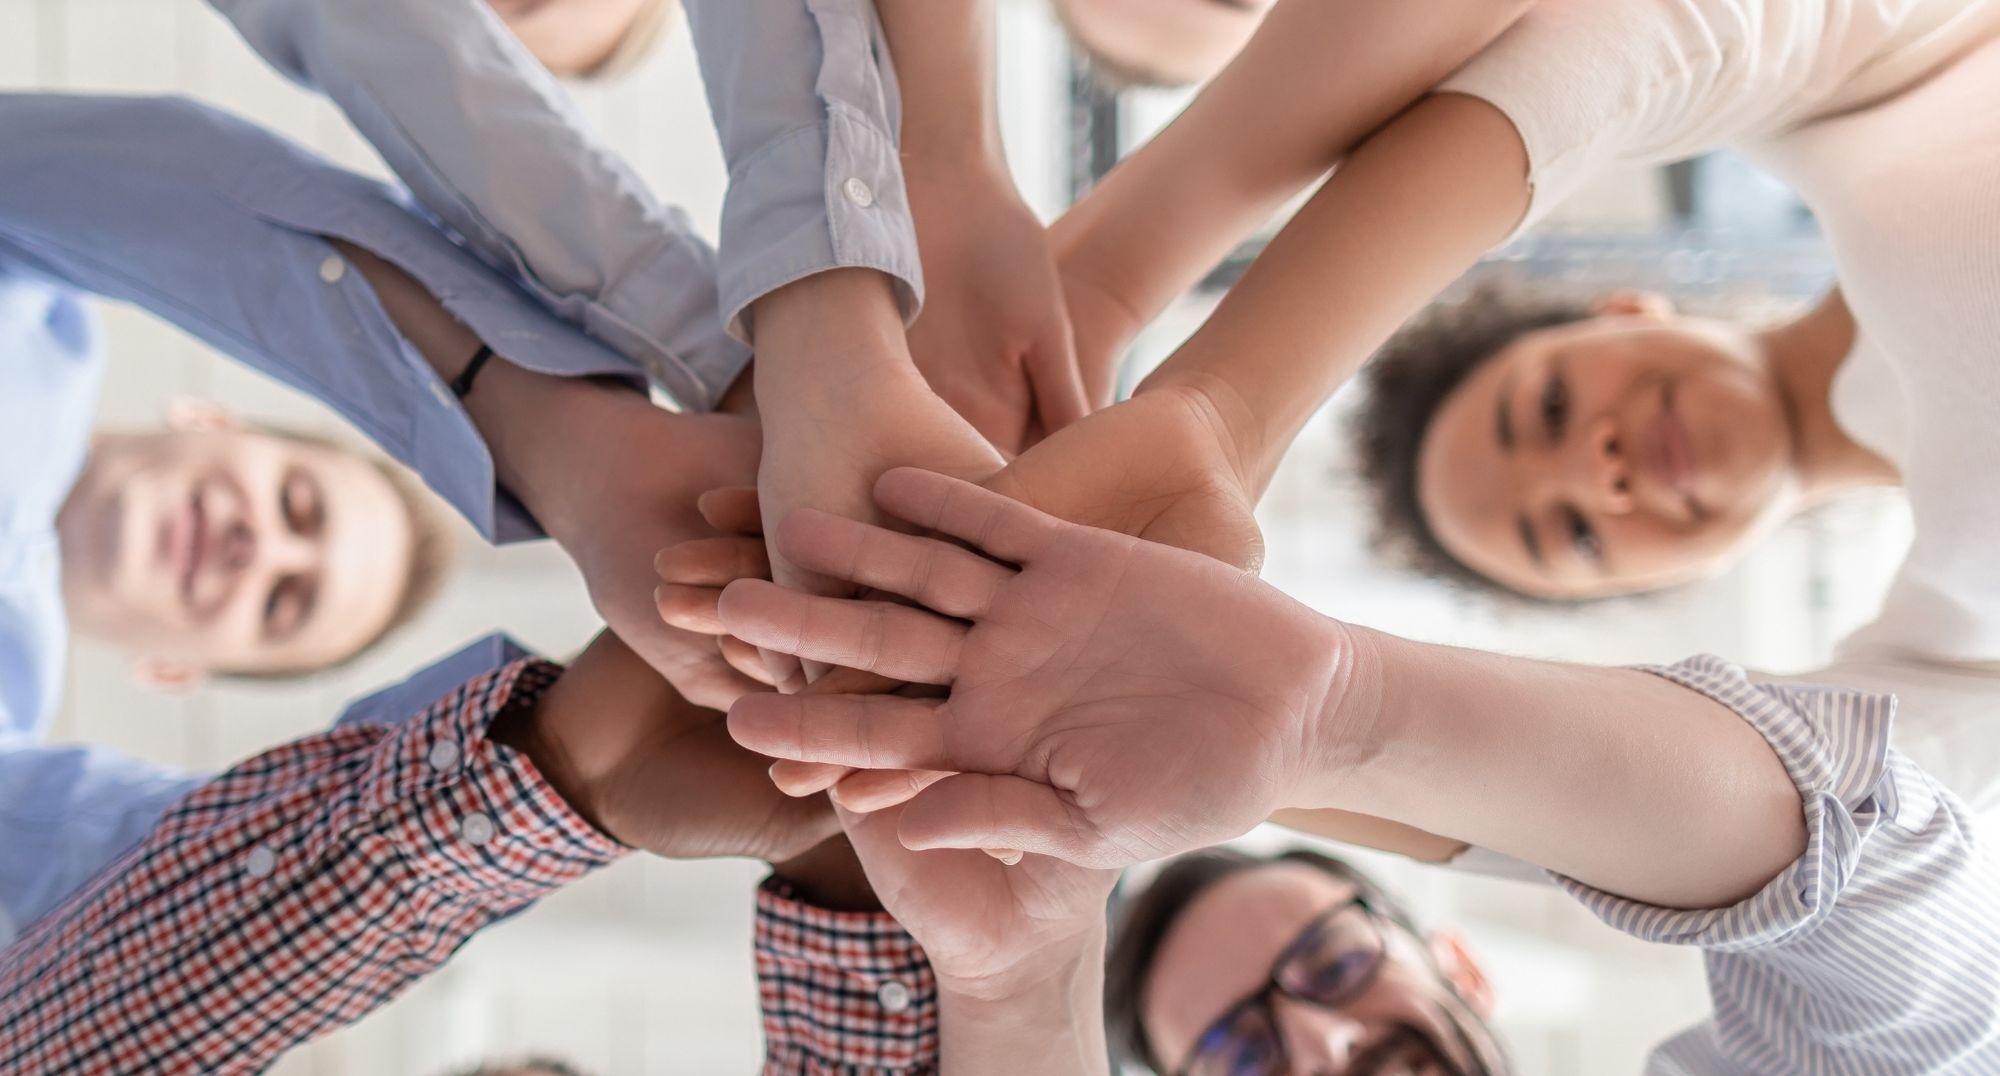 firemná kultúra - sme jeden tím